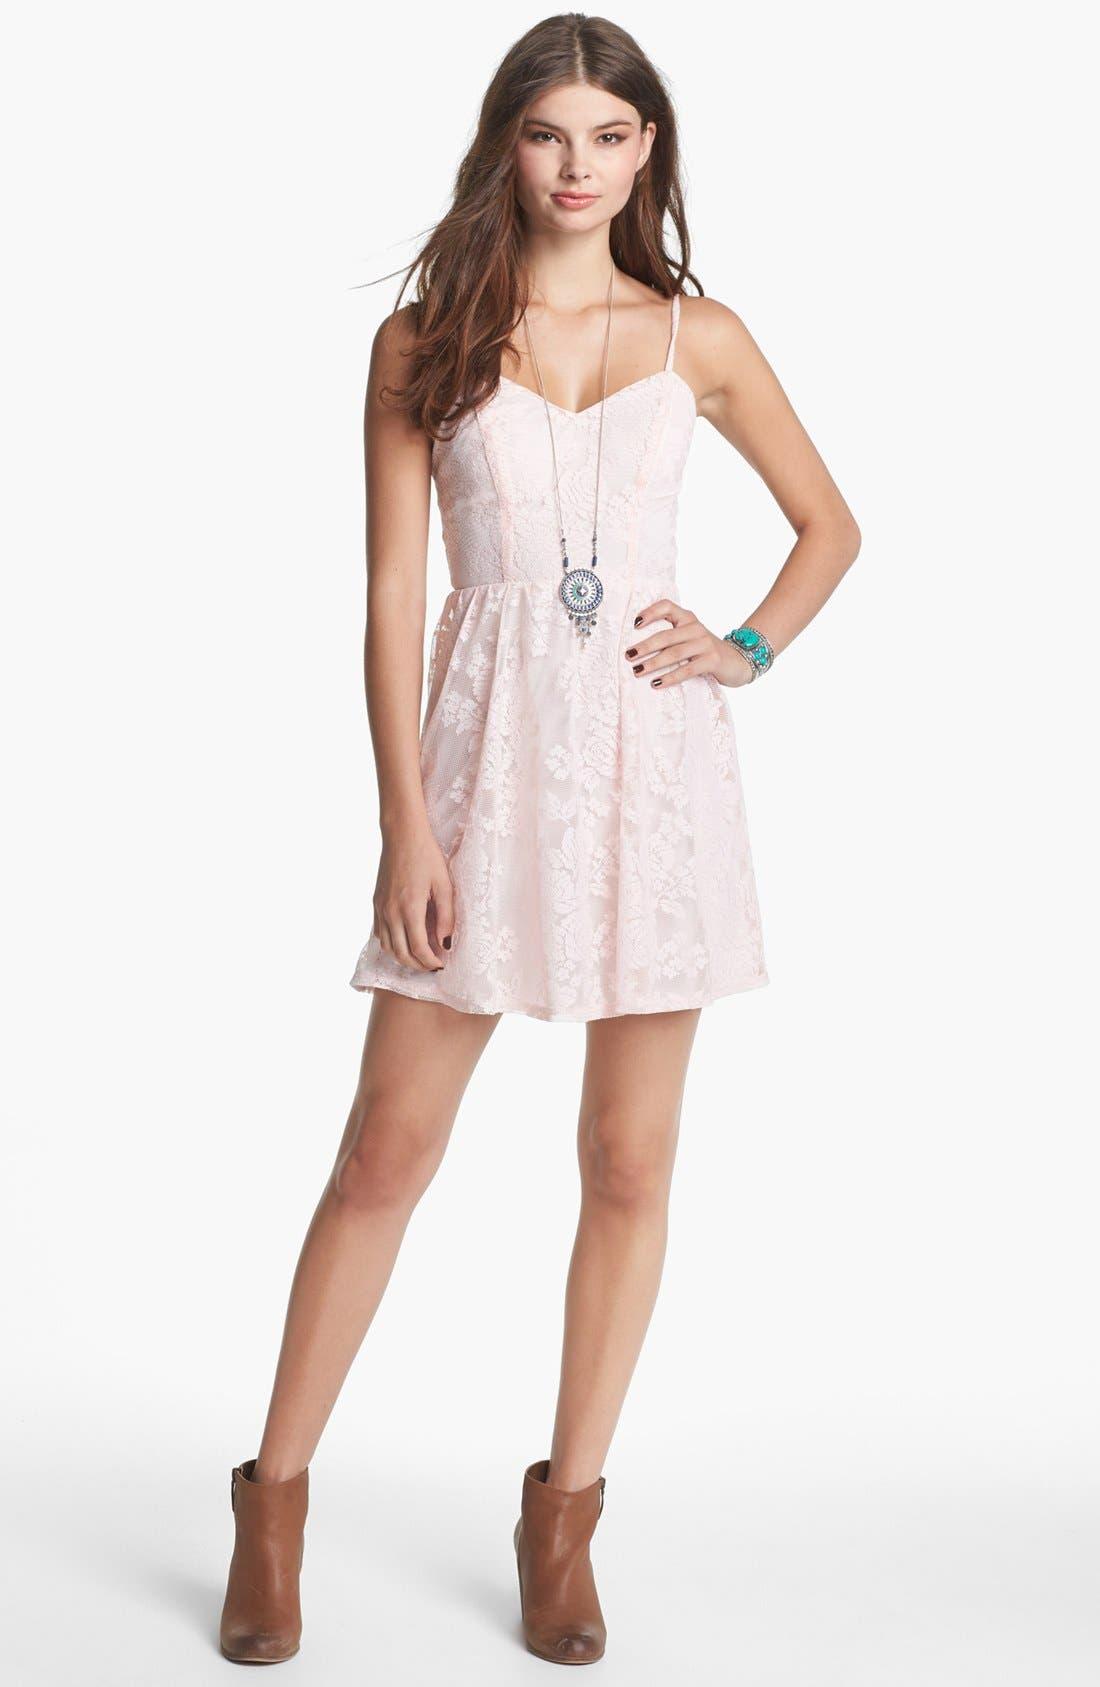 Alternate Image 1 Selected - Socialite Lace Skater Dress (Juniors) (Online Only)